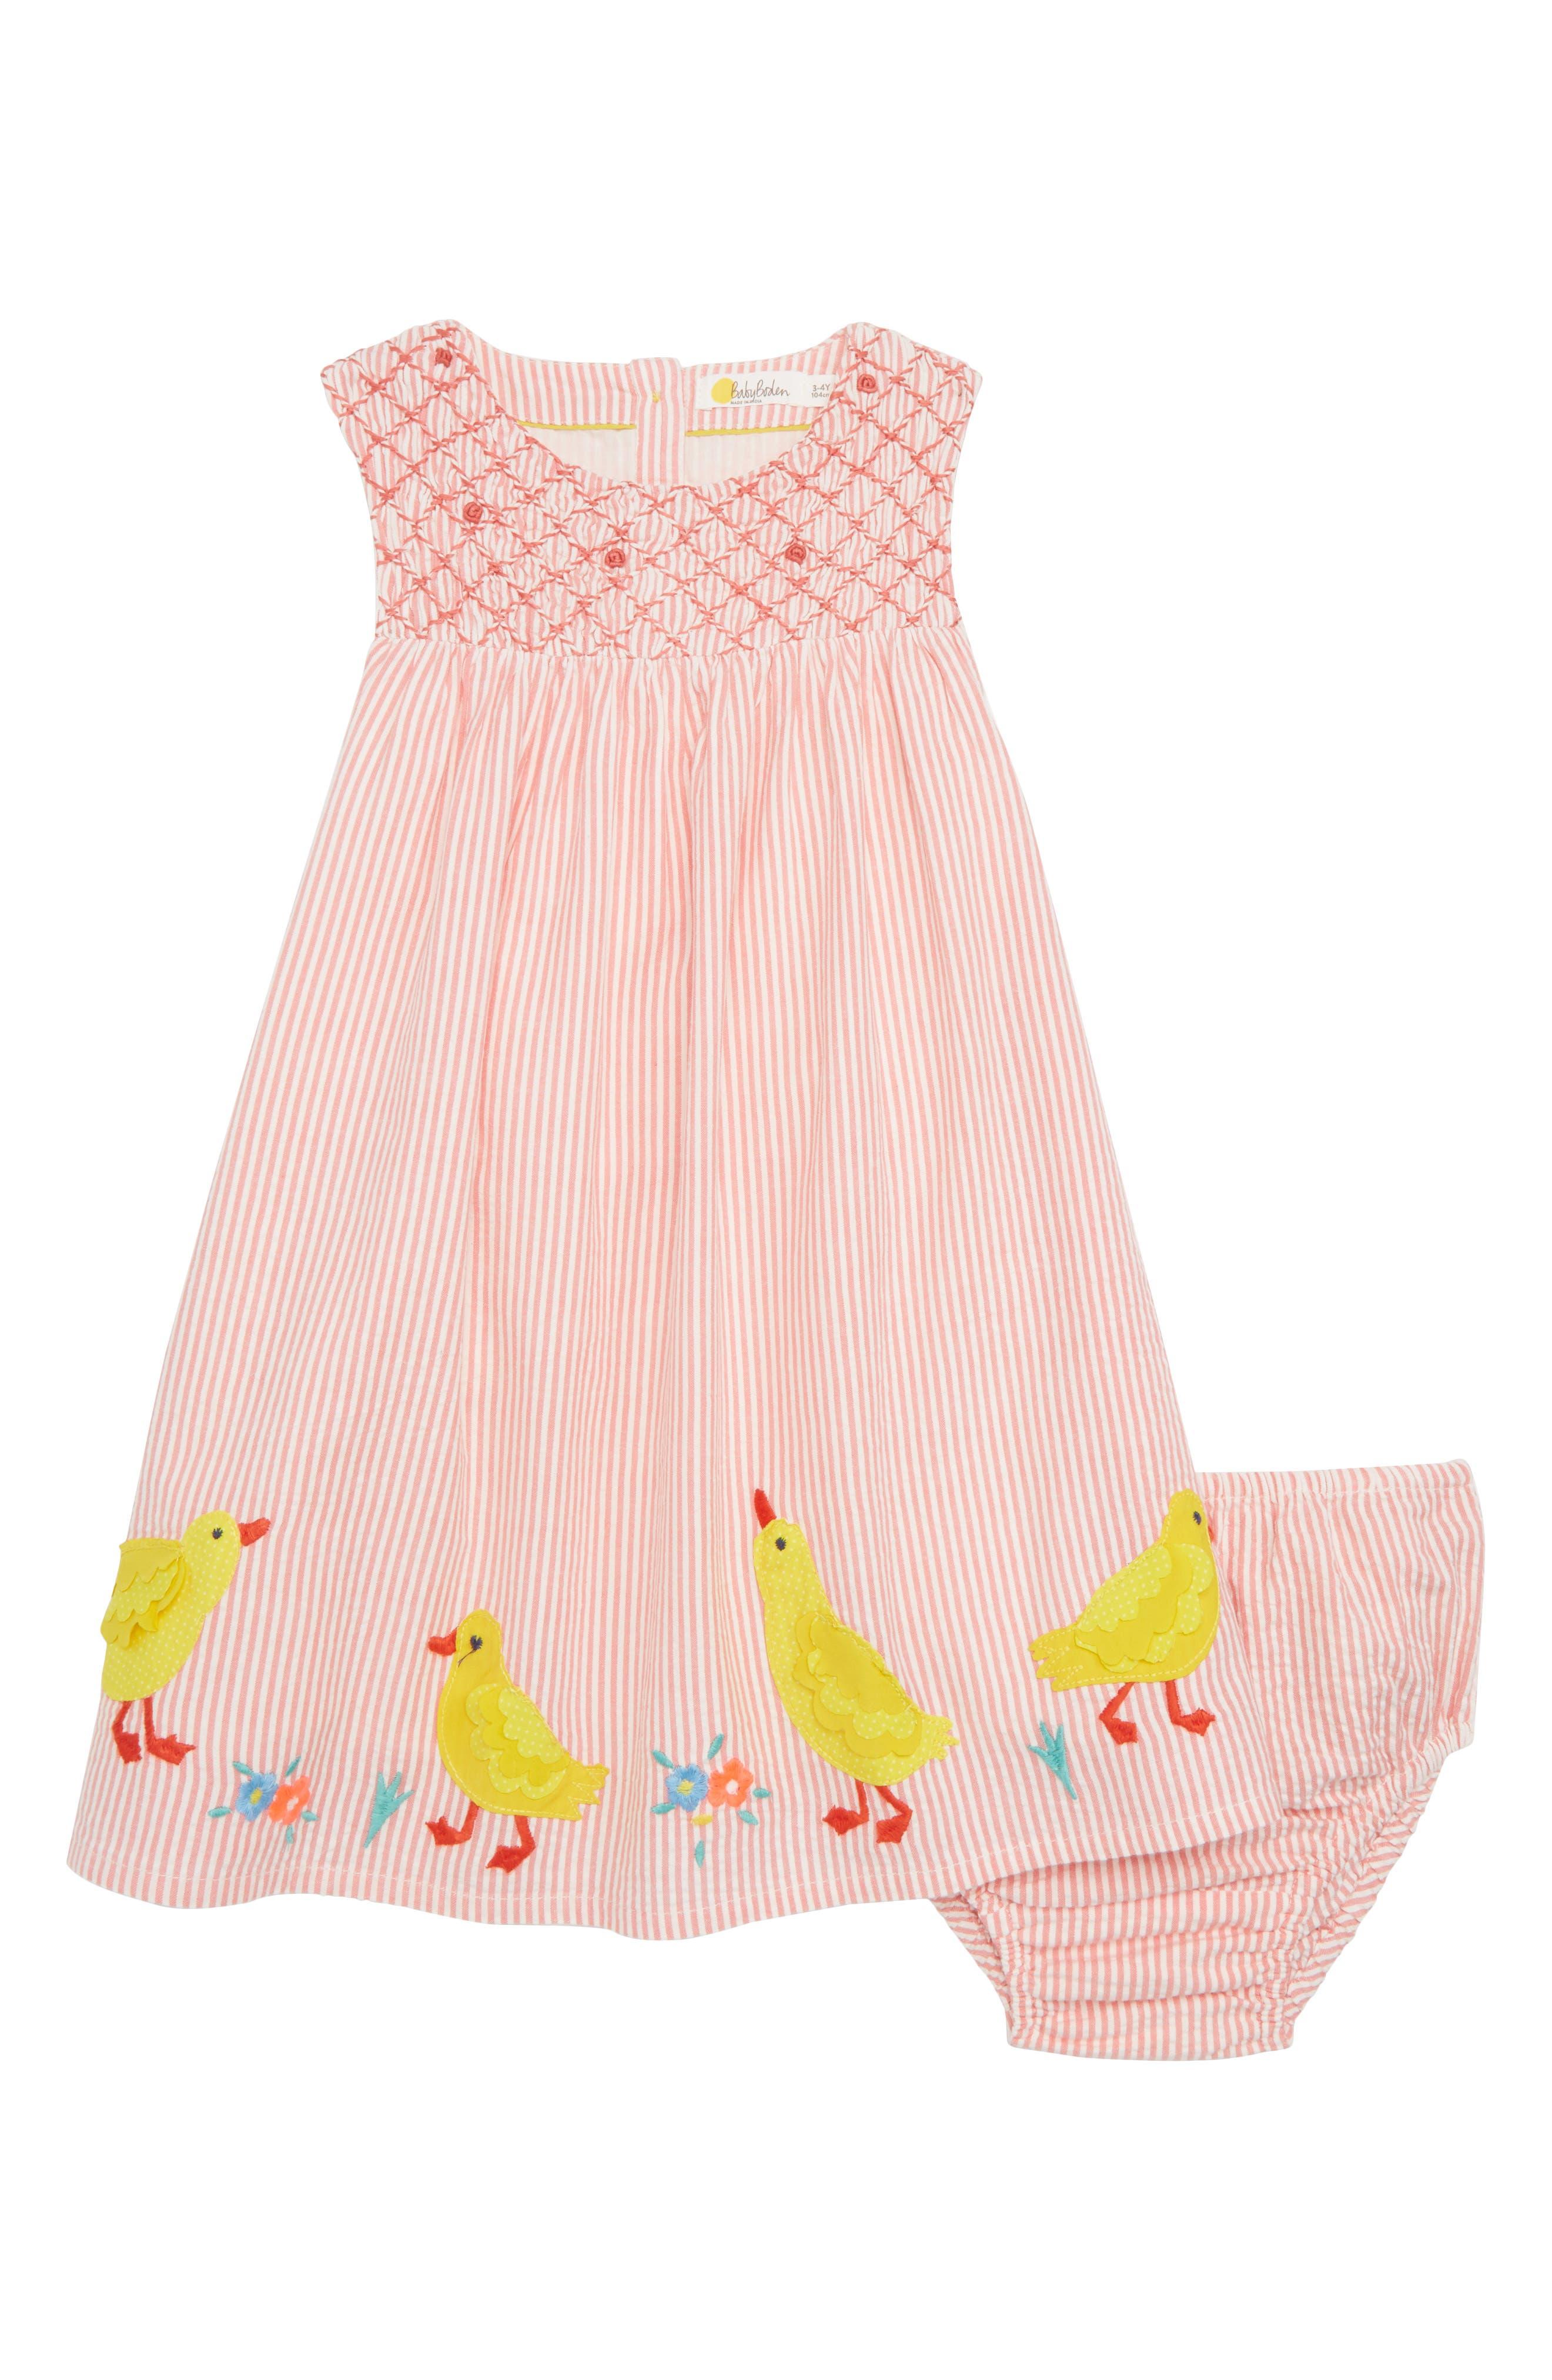 Smocked Chick Appliqué Dress,                         Main,                         color, Crab Apple/ Pink Duck